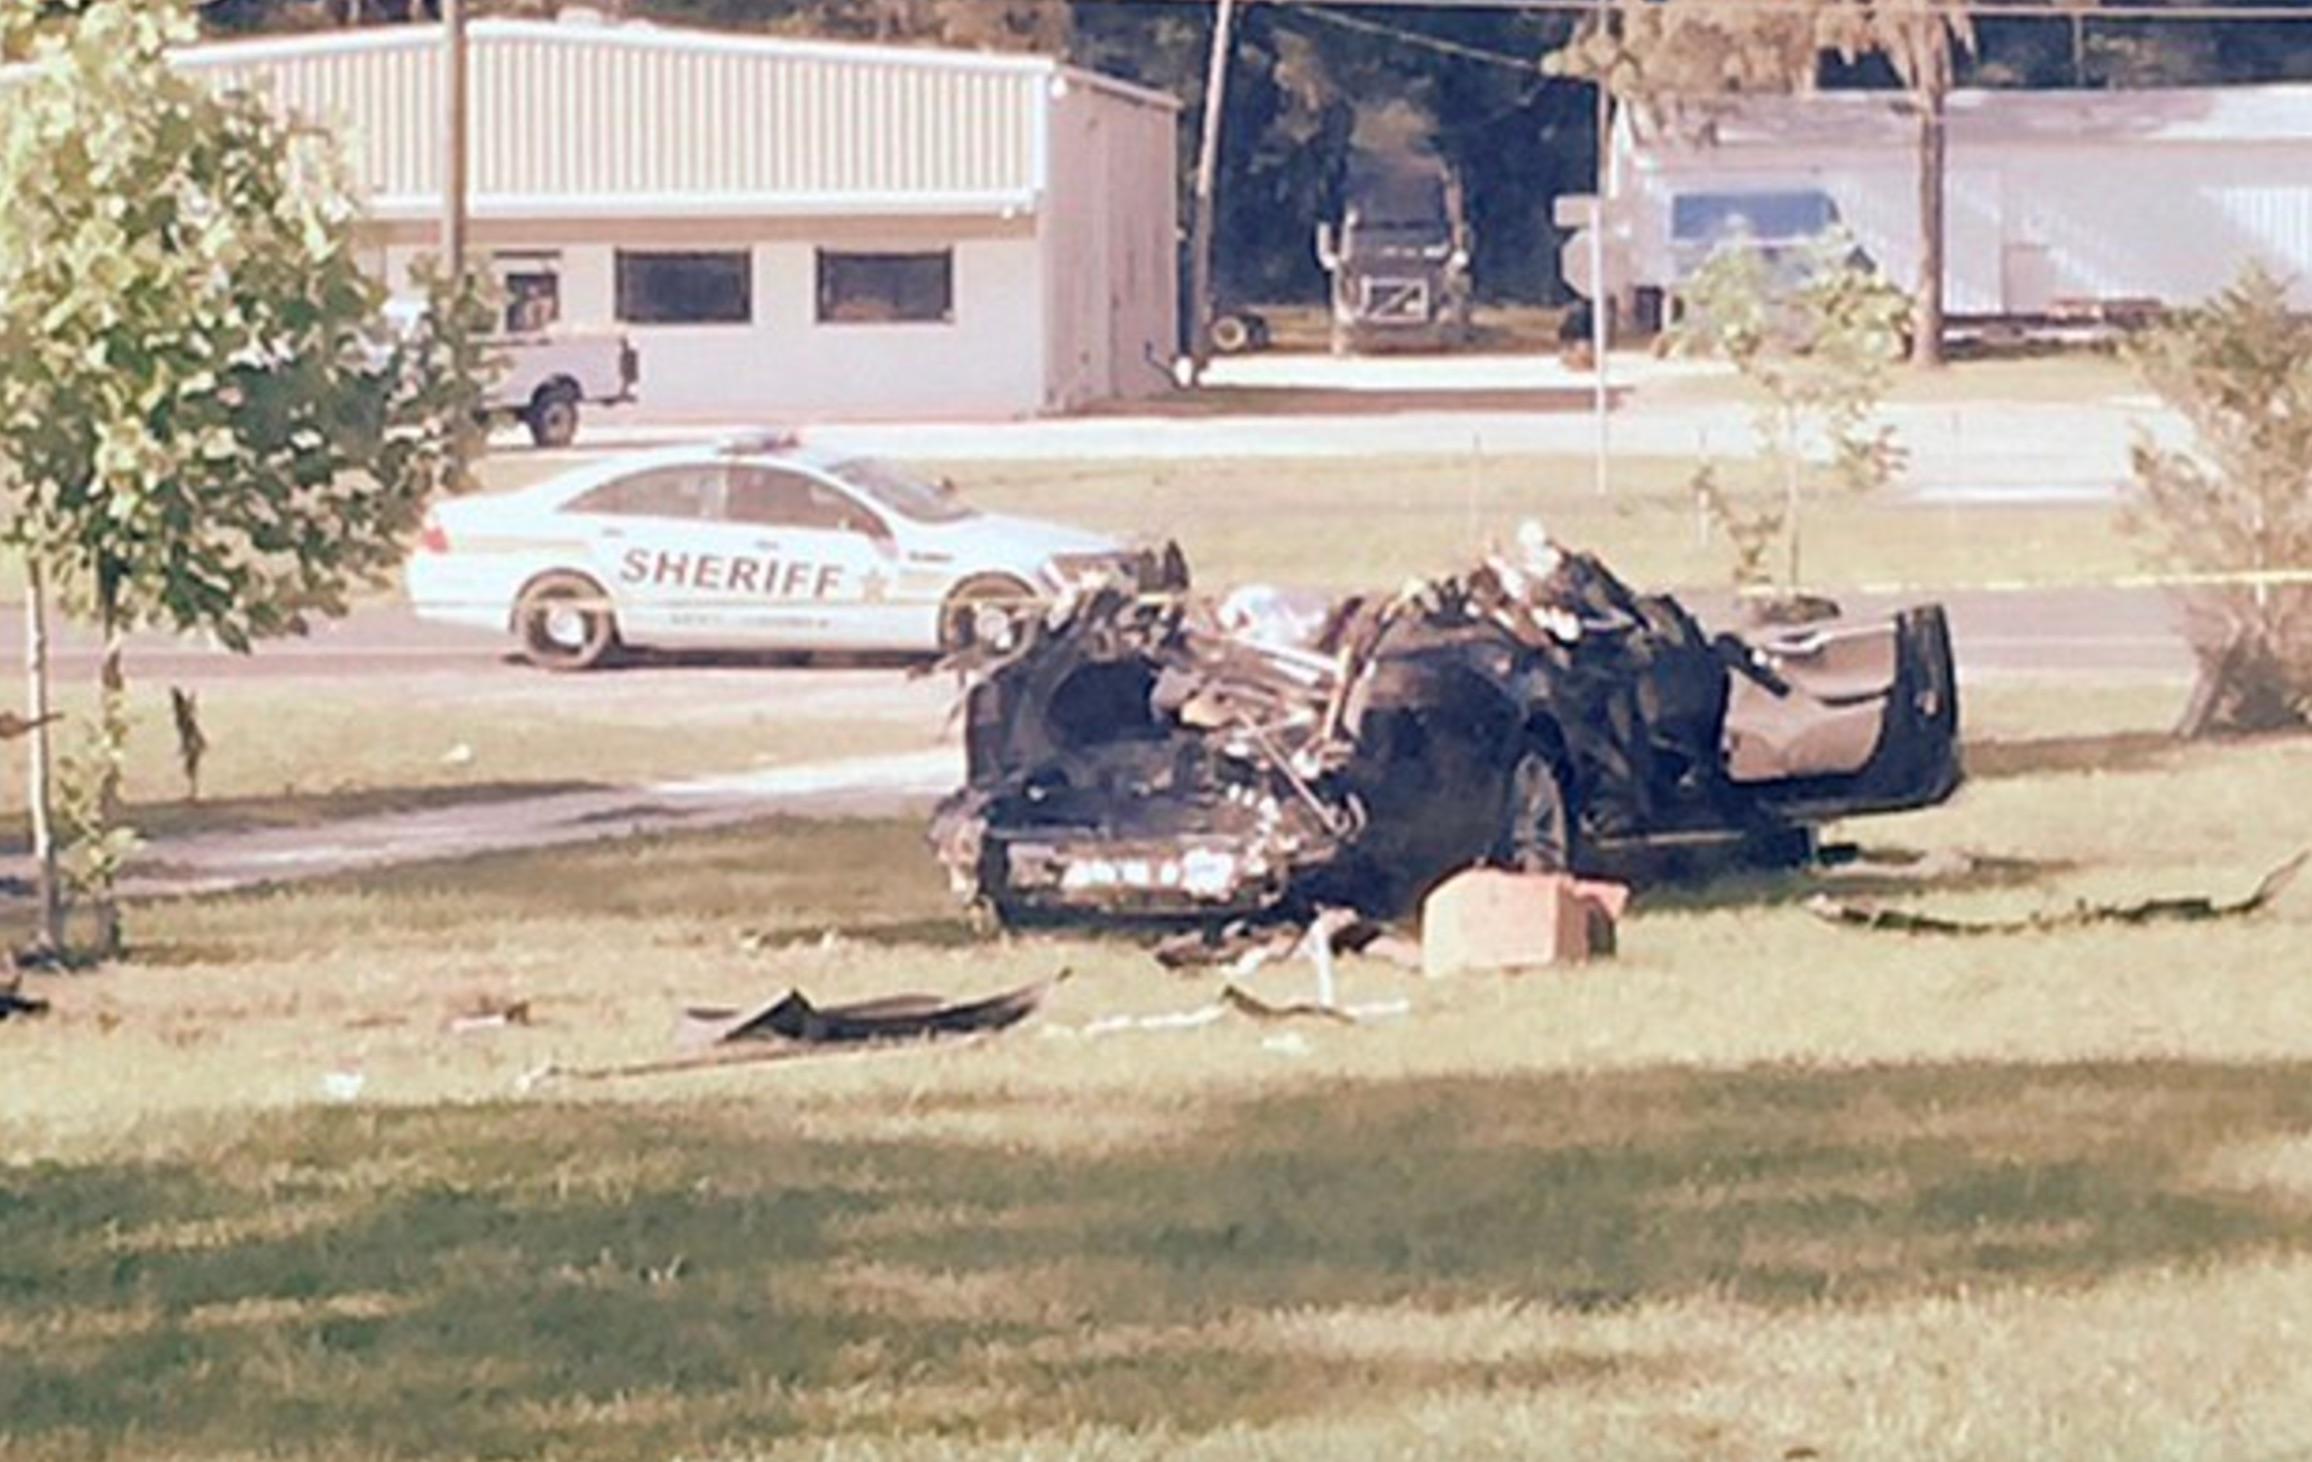 tesla-first-fatality-joshua-brown-autopilot-crash